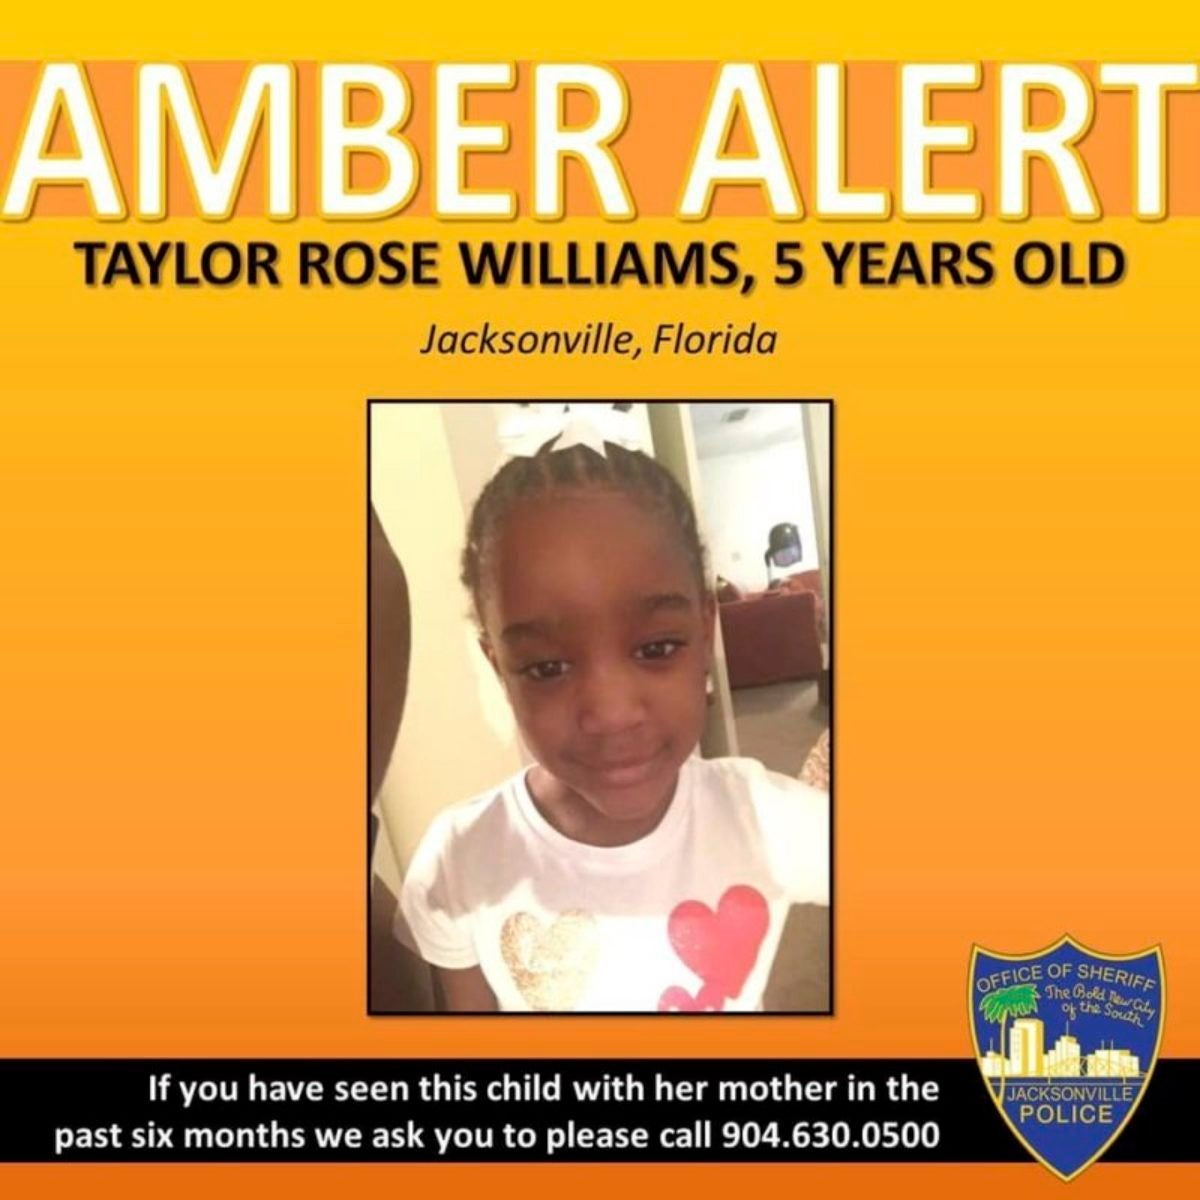 Amber Alert for Taylor Rose Williams